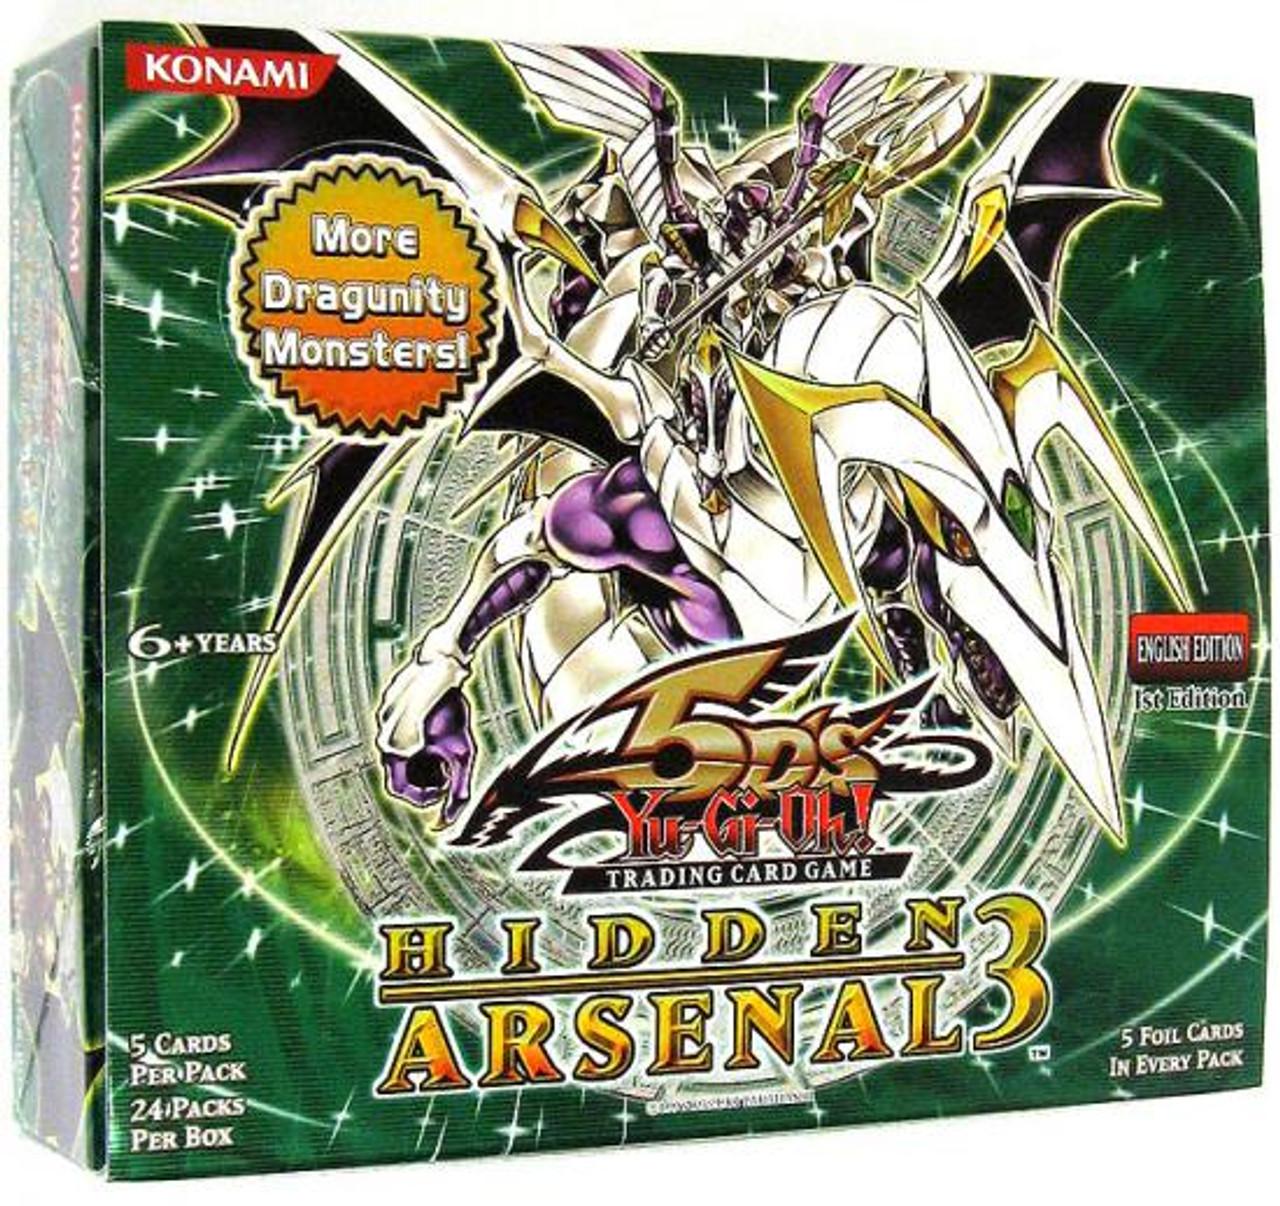 YuGiOh Hidden Arsenal 3 Booster Box [24 Packs] [Sealed]